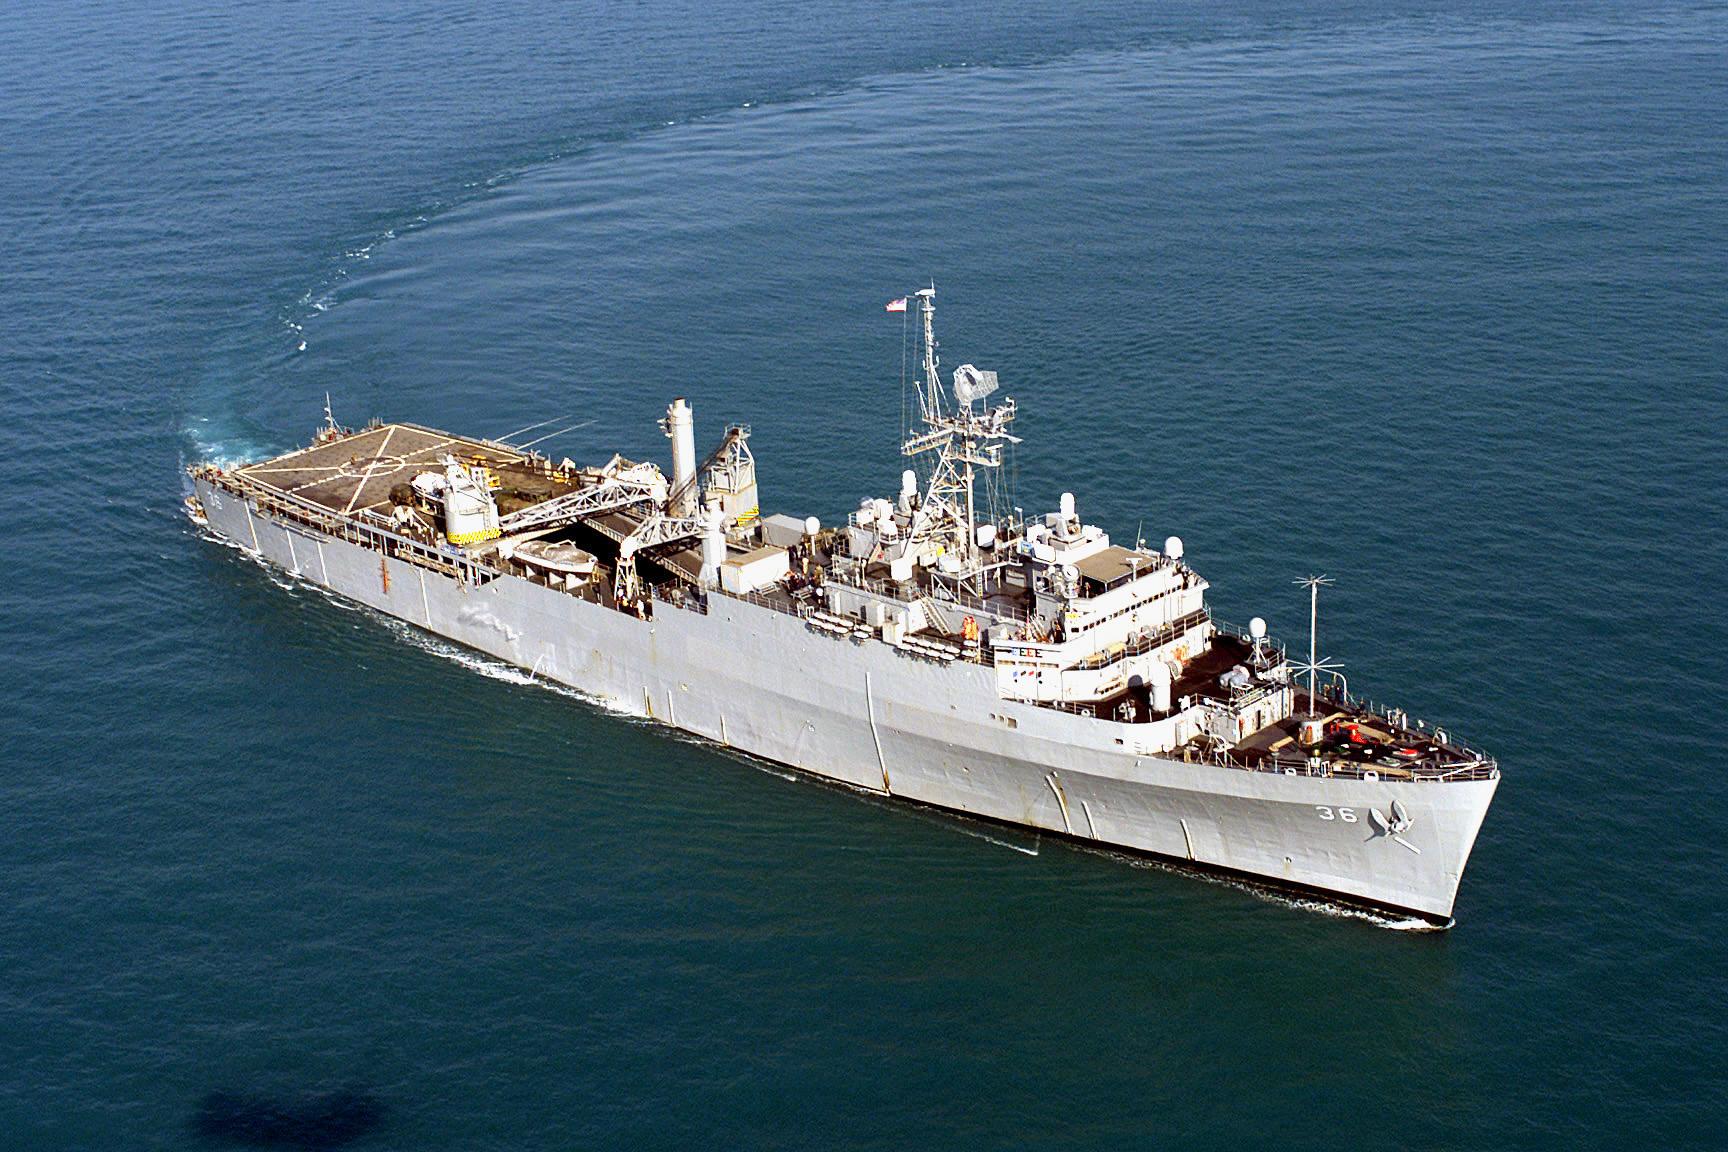 File Us Navy 000907 N 8743m 018 Uss Anchorage Lsd 36 Jpg